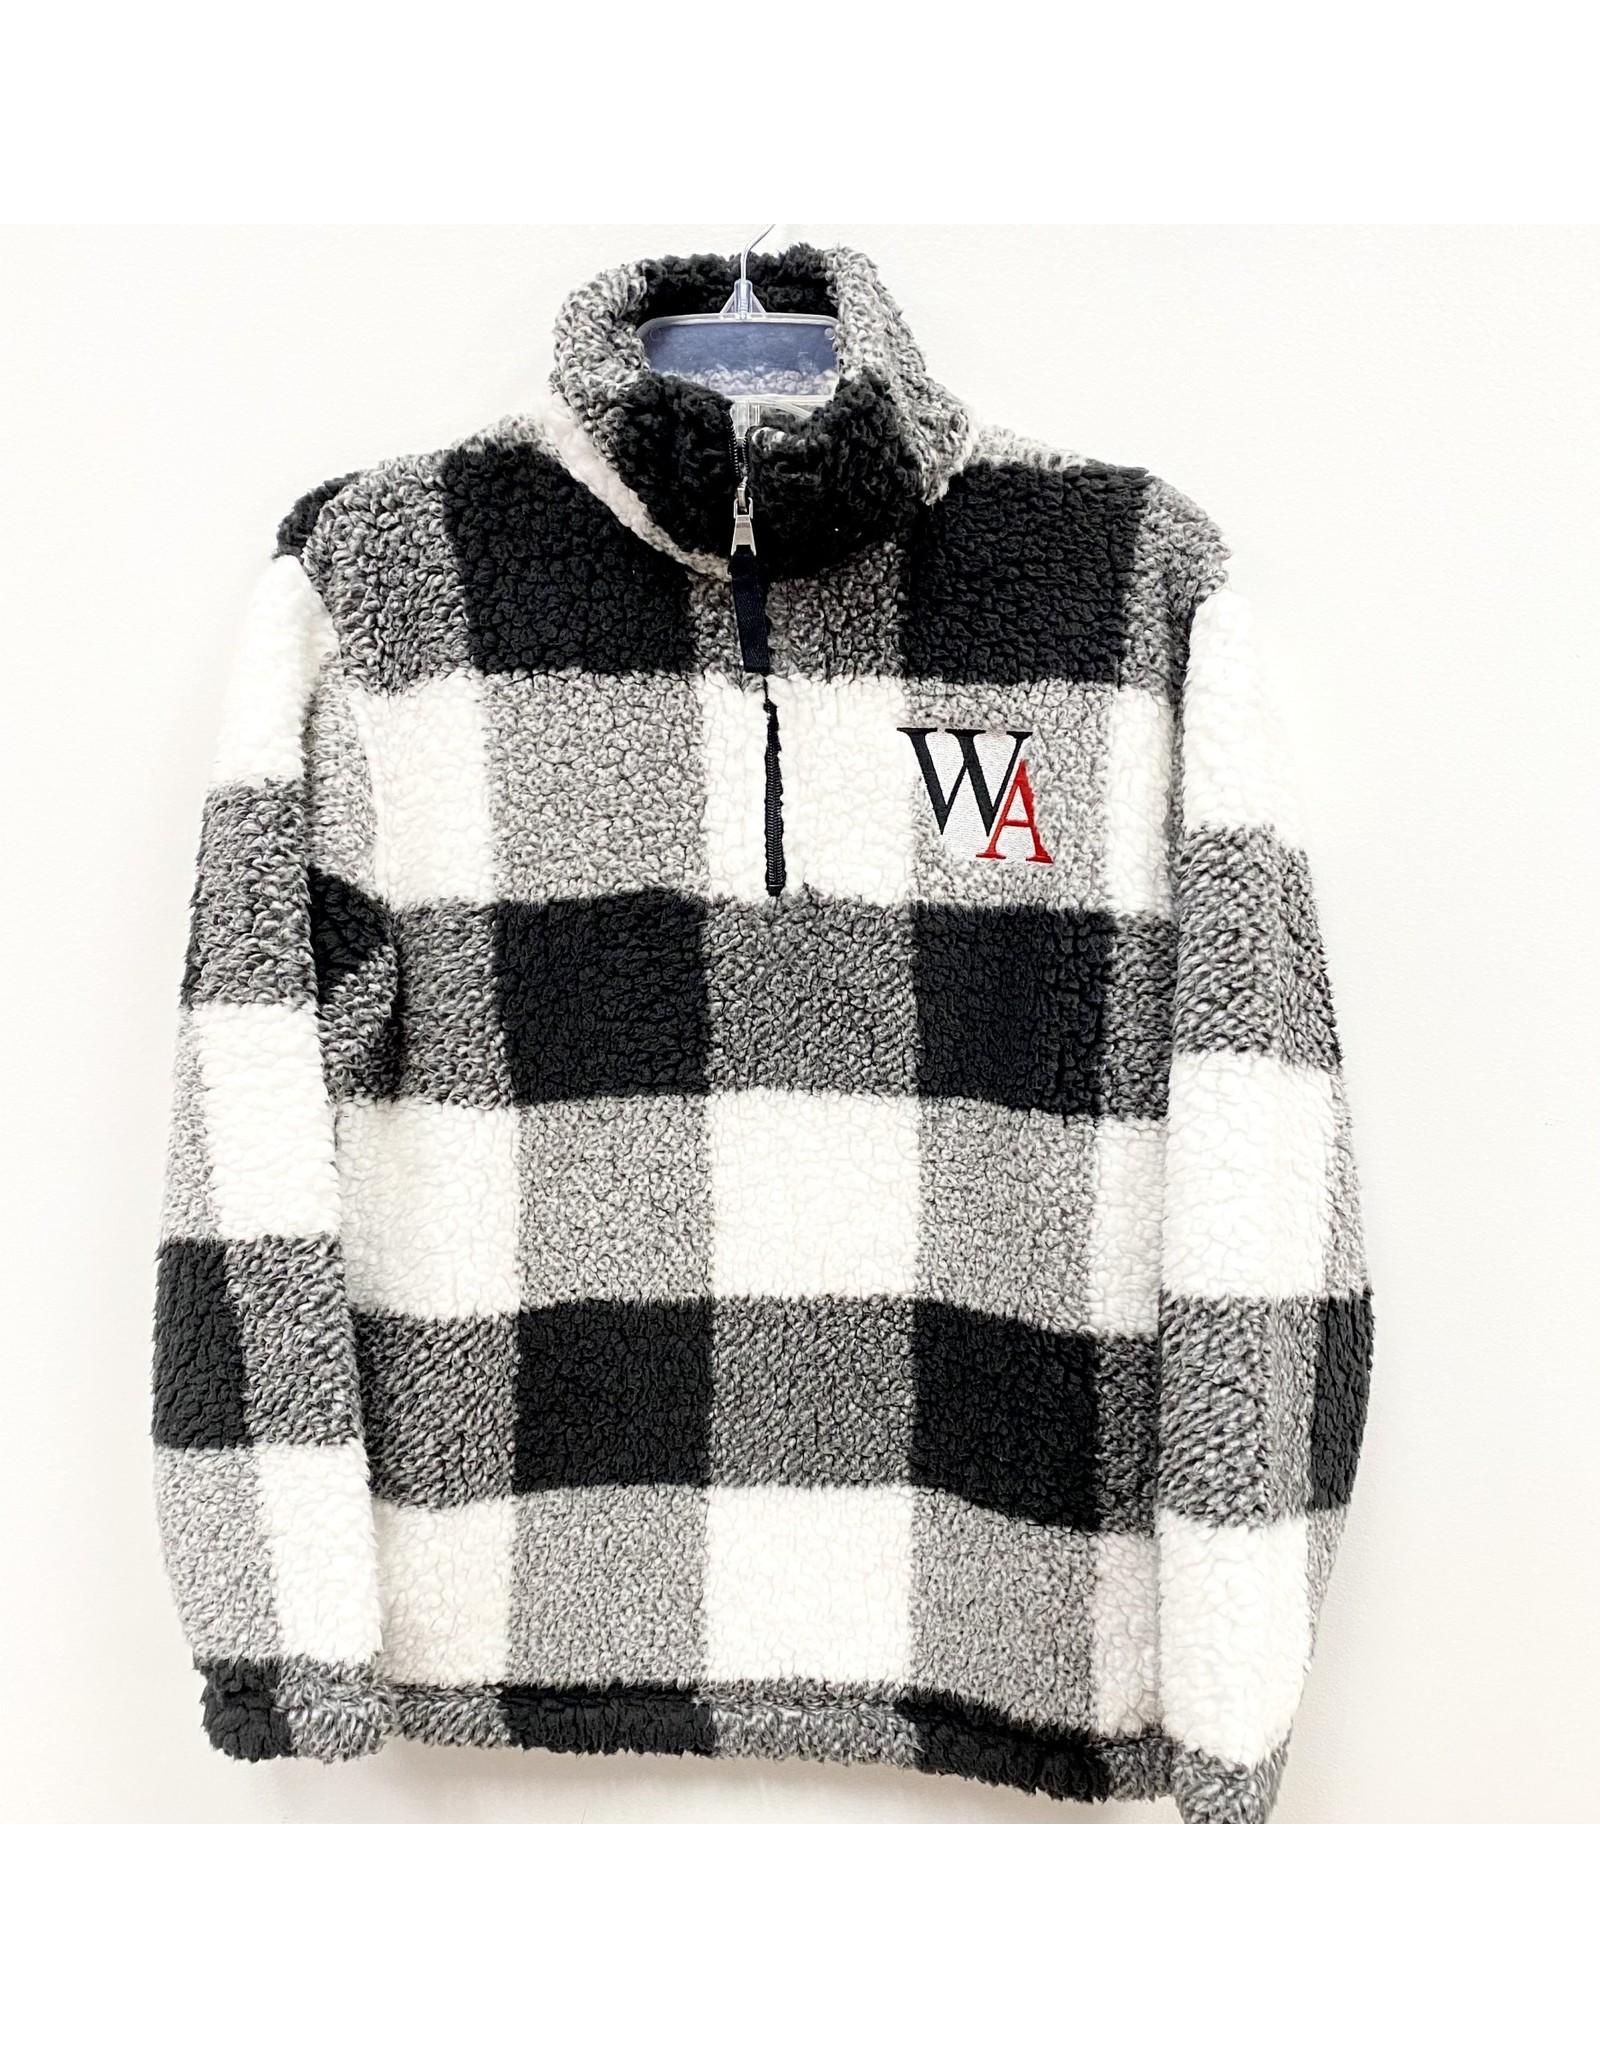 Boxercraft Sherpa 1/4 Zip Pullover in Black Check